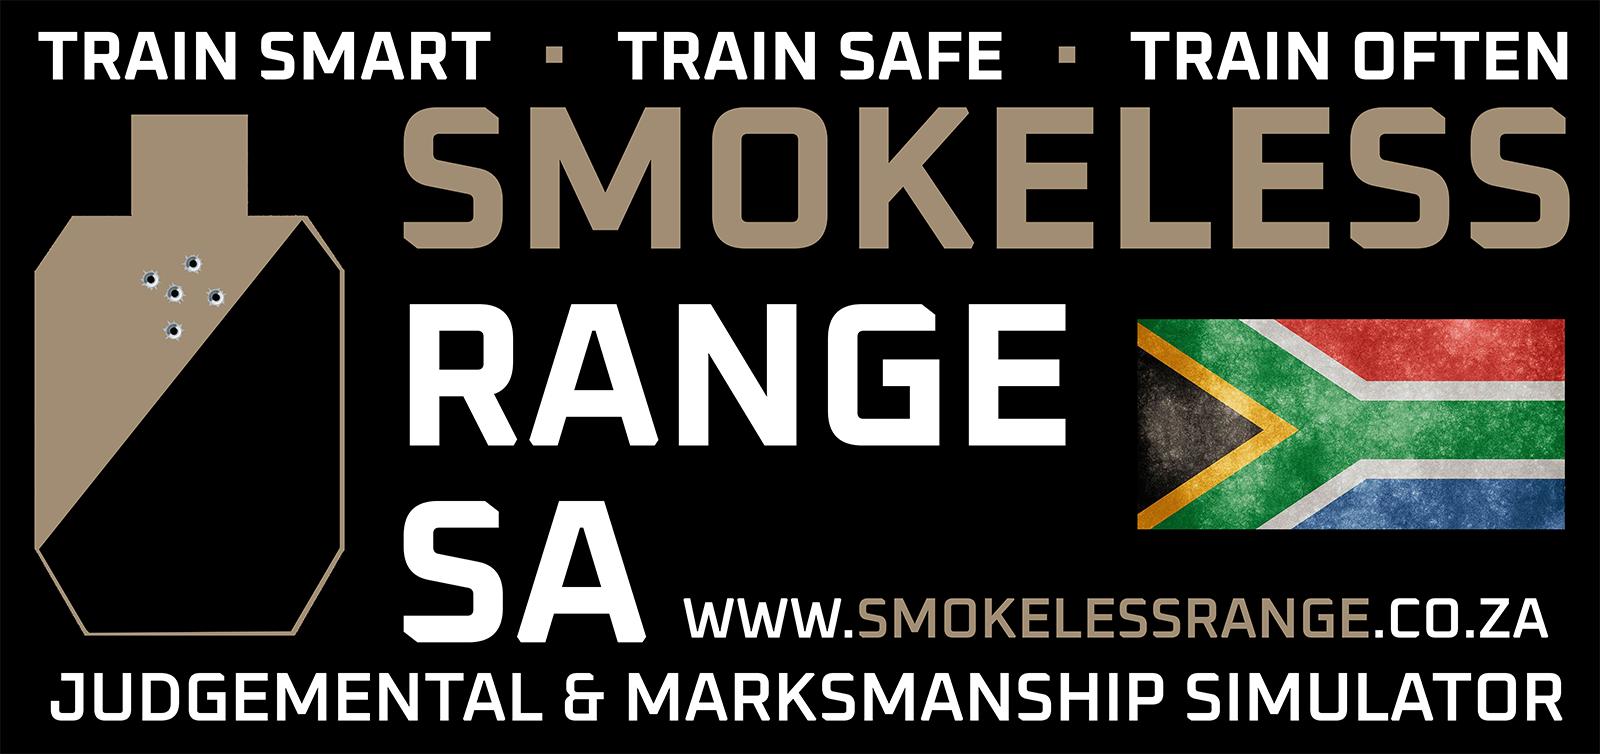 Smokeless Range SA Judgemental and Marksmanship Simulator